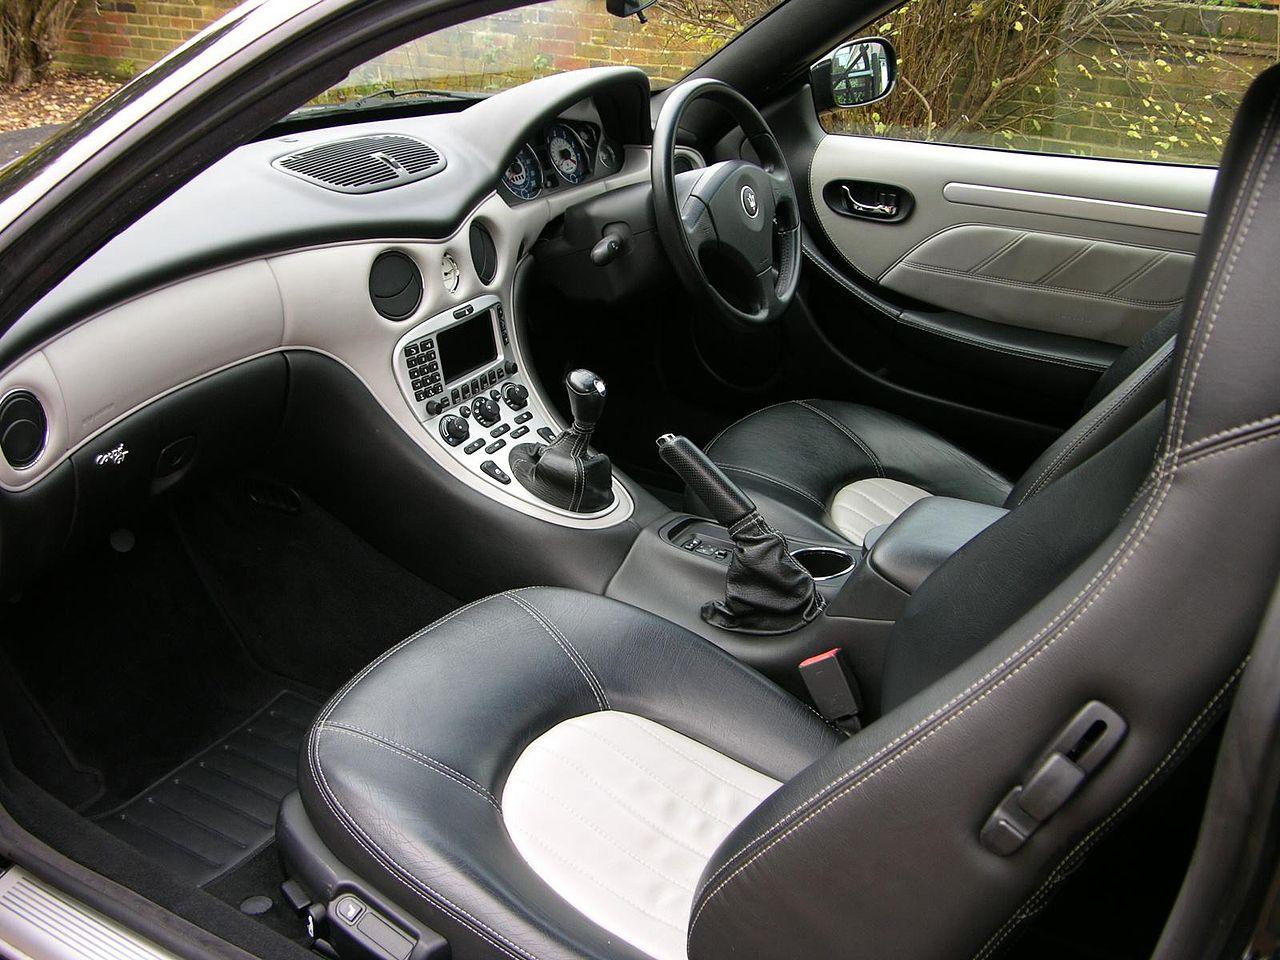 file 2005 maserati 4200 gt flickr the car spy 13 jpg wikimedia commons. Black Bedroom Furniture Sets. Home Design Ideas